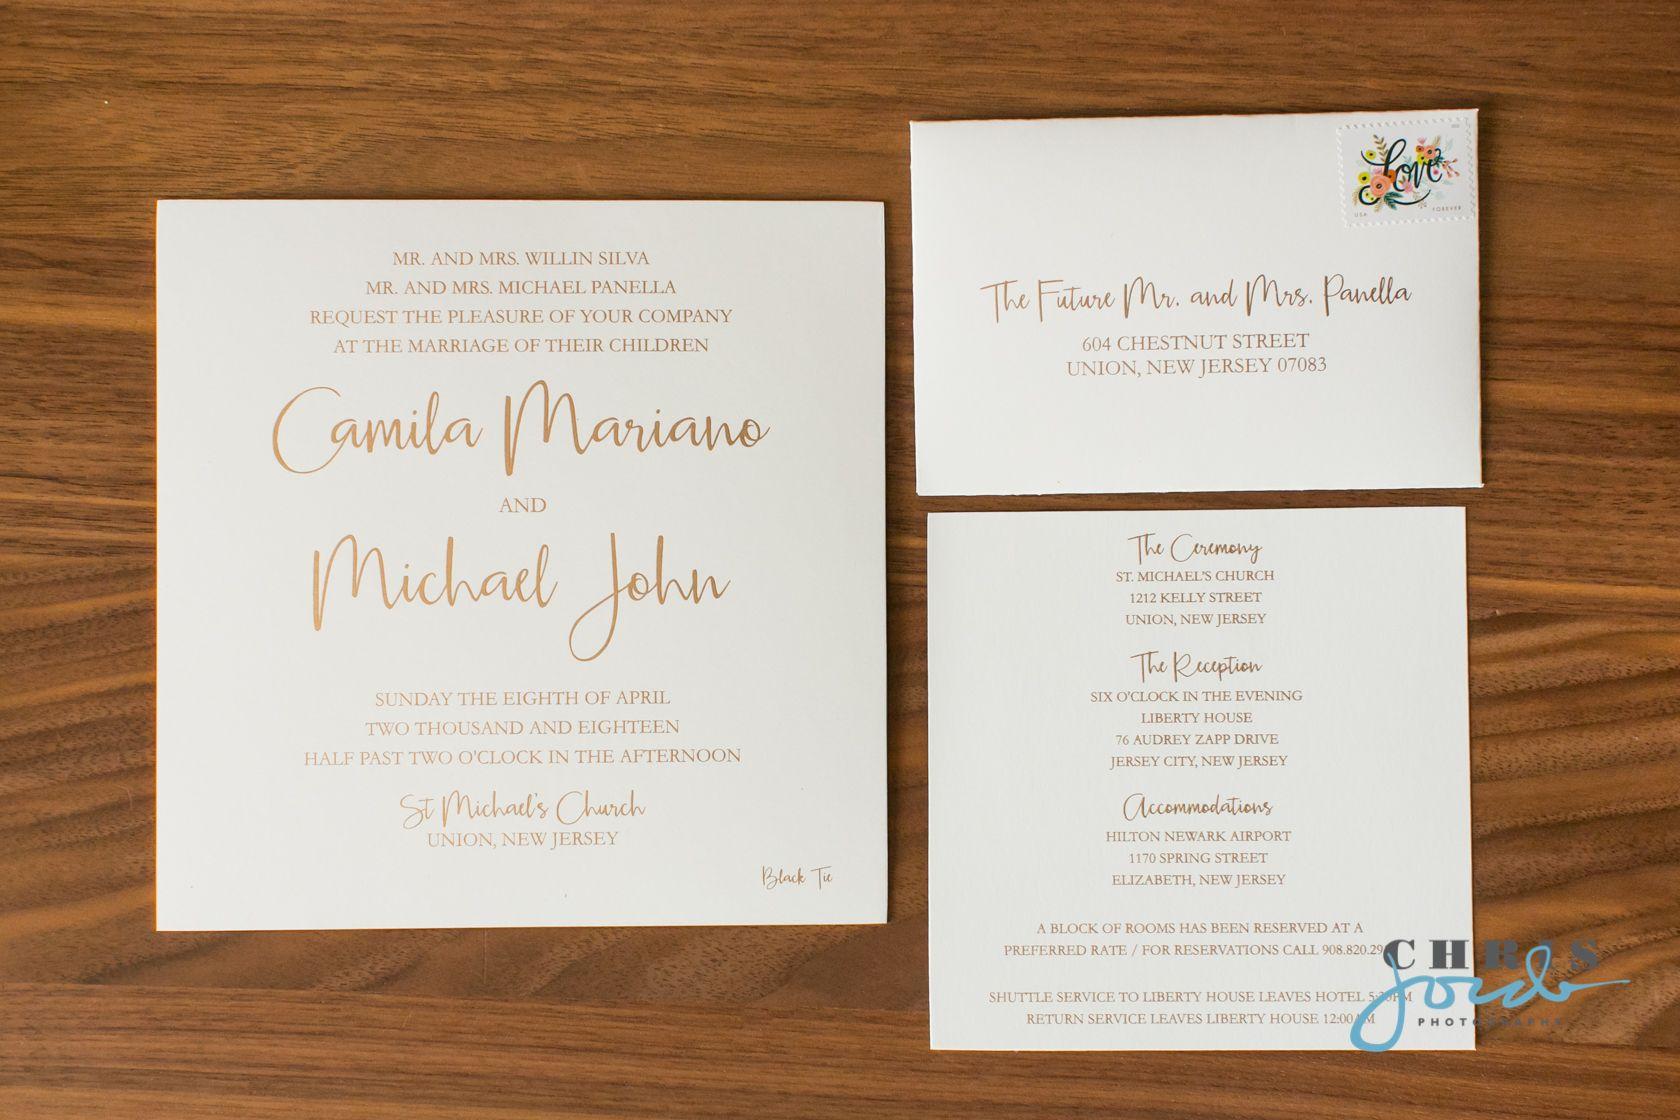 Camila Michael 4 8 Chris Jorda Photography Simple Wedding Invitations Wedding Invitations City Wedding